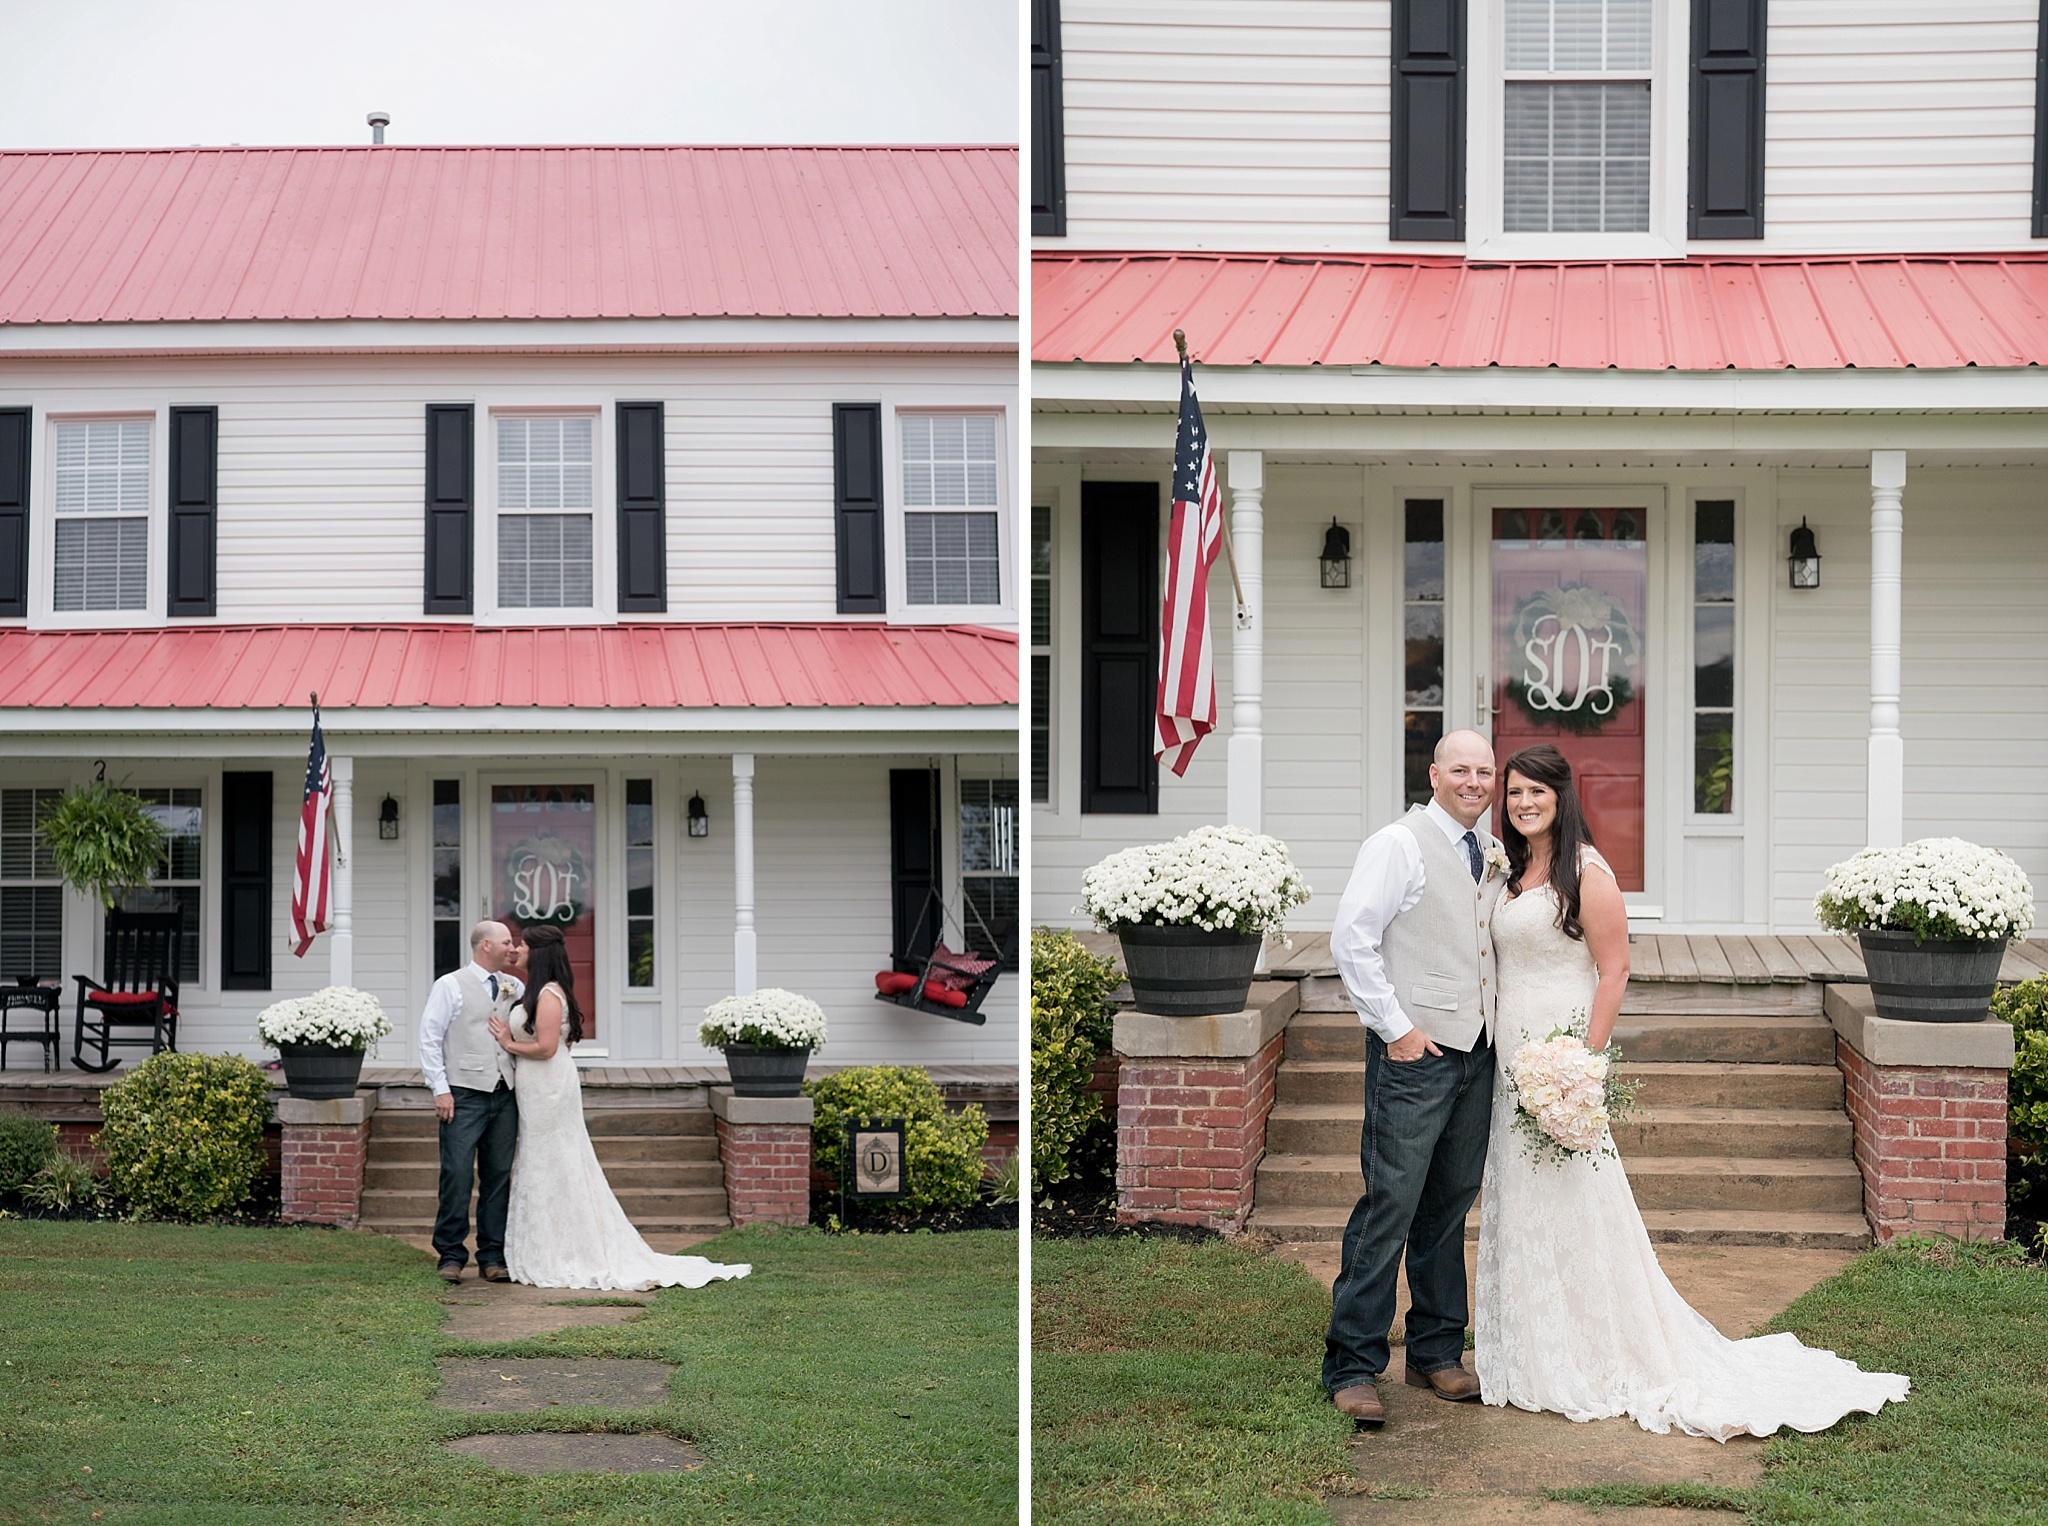 Tarboro-NC-Wedding-Photographer-022.jpg